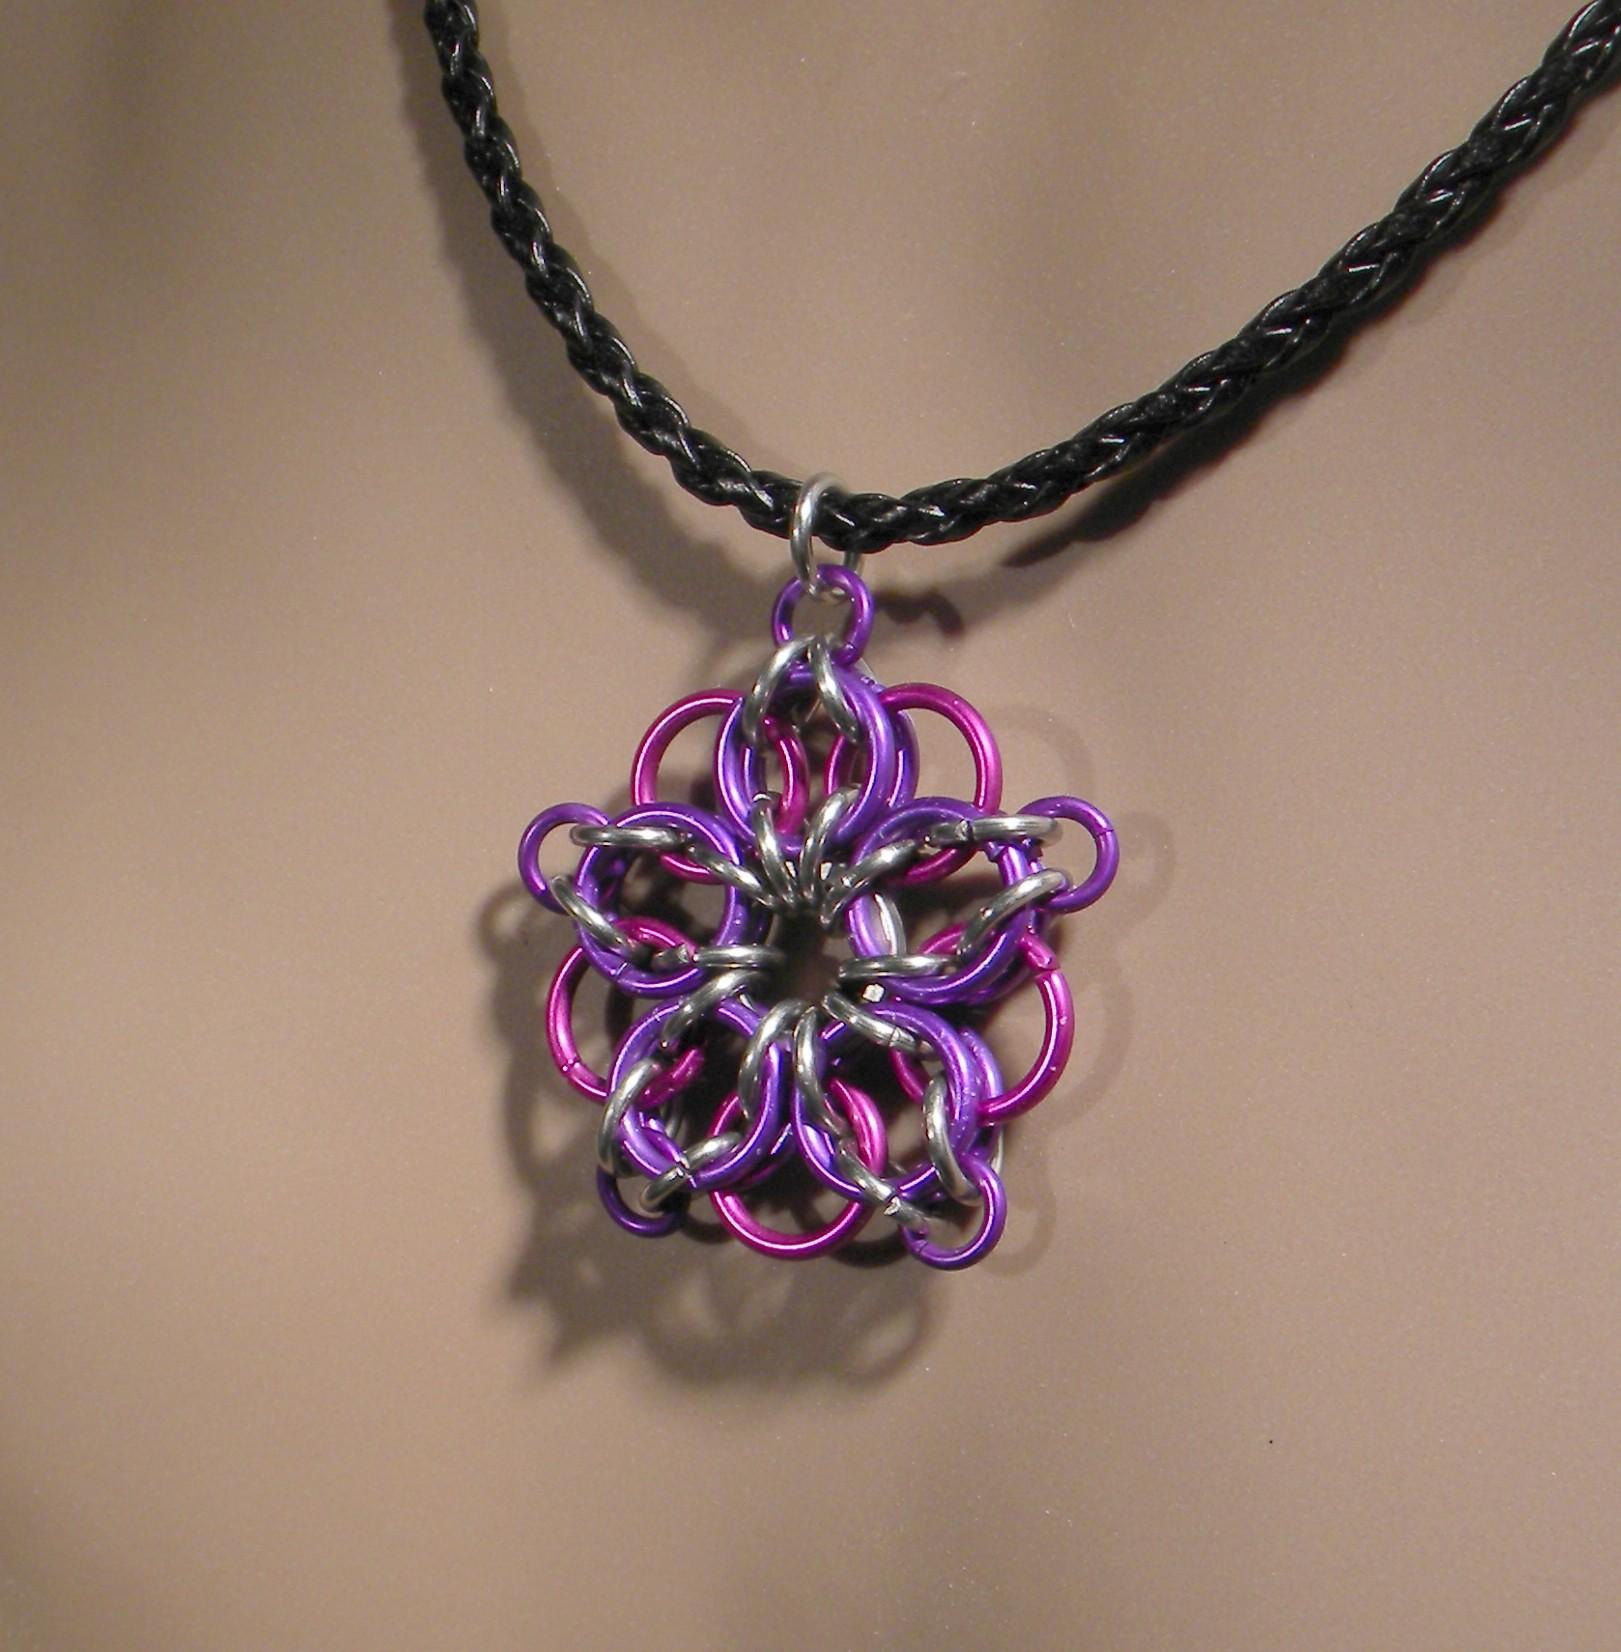 Celtic Star Necklace (Violet/Plum)